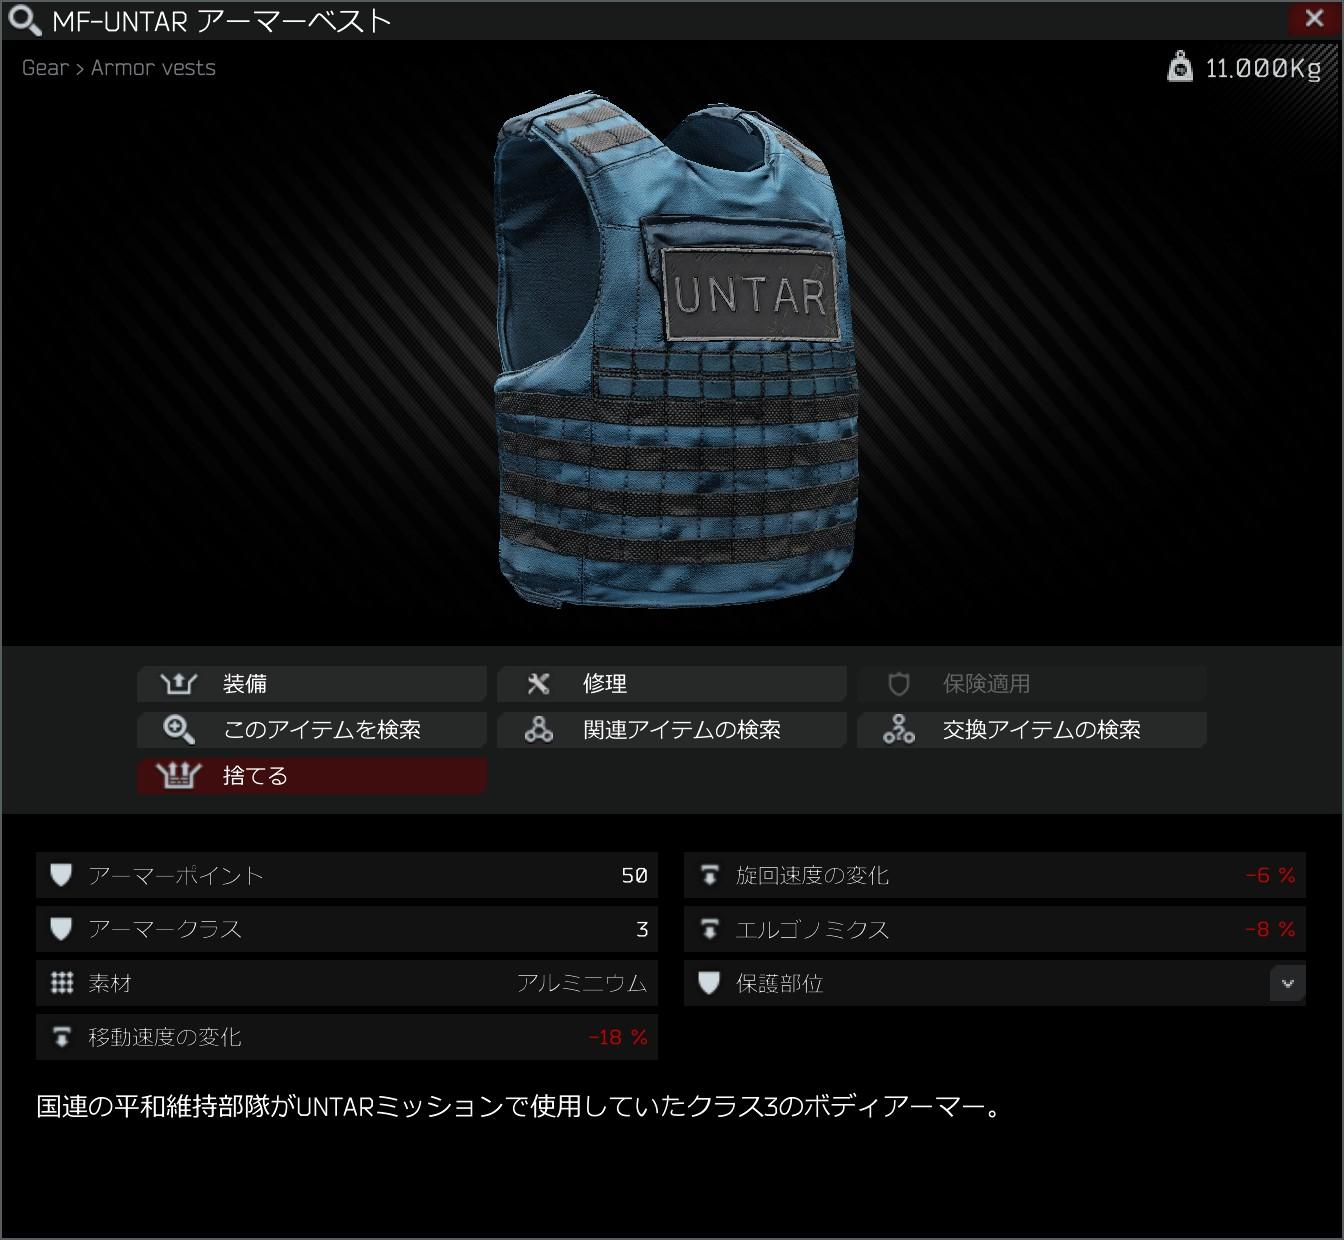 MF-UNTAR armor vest.jpg